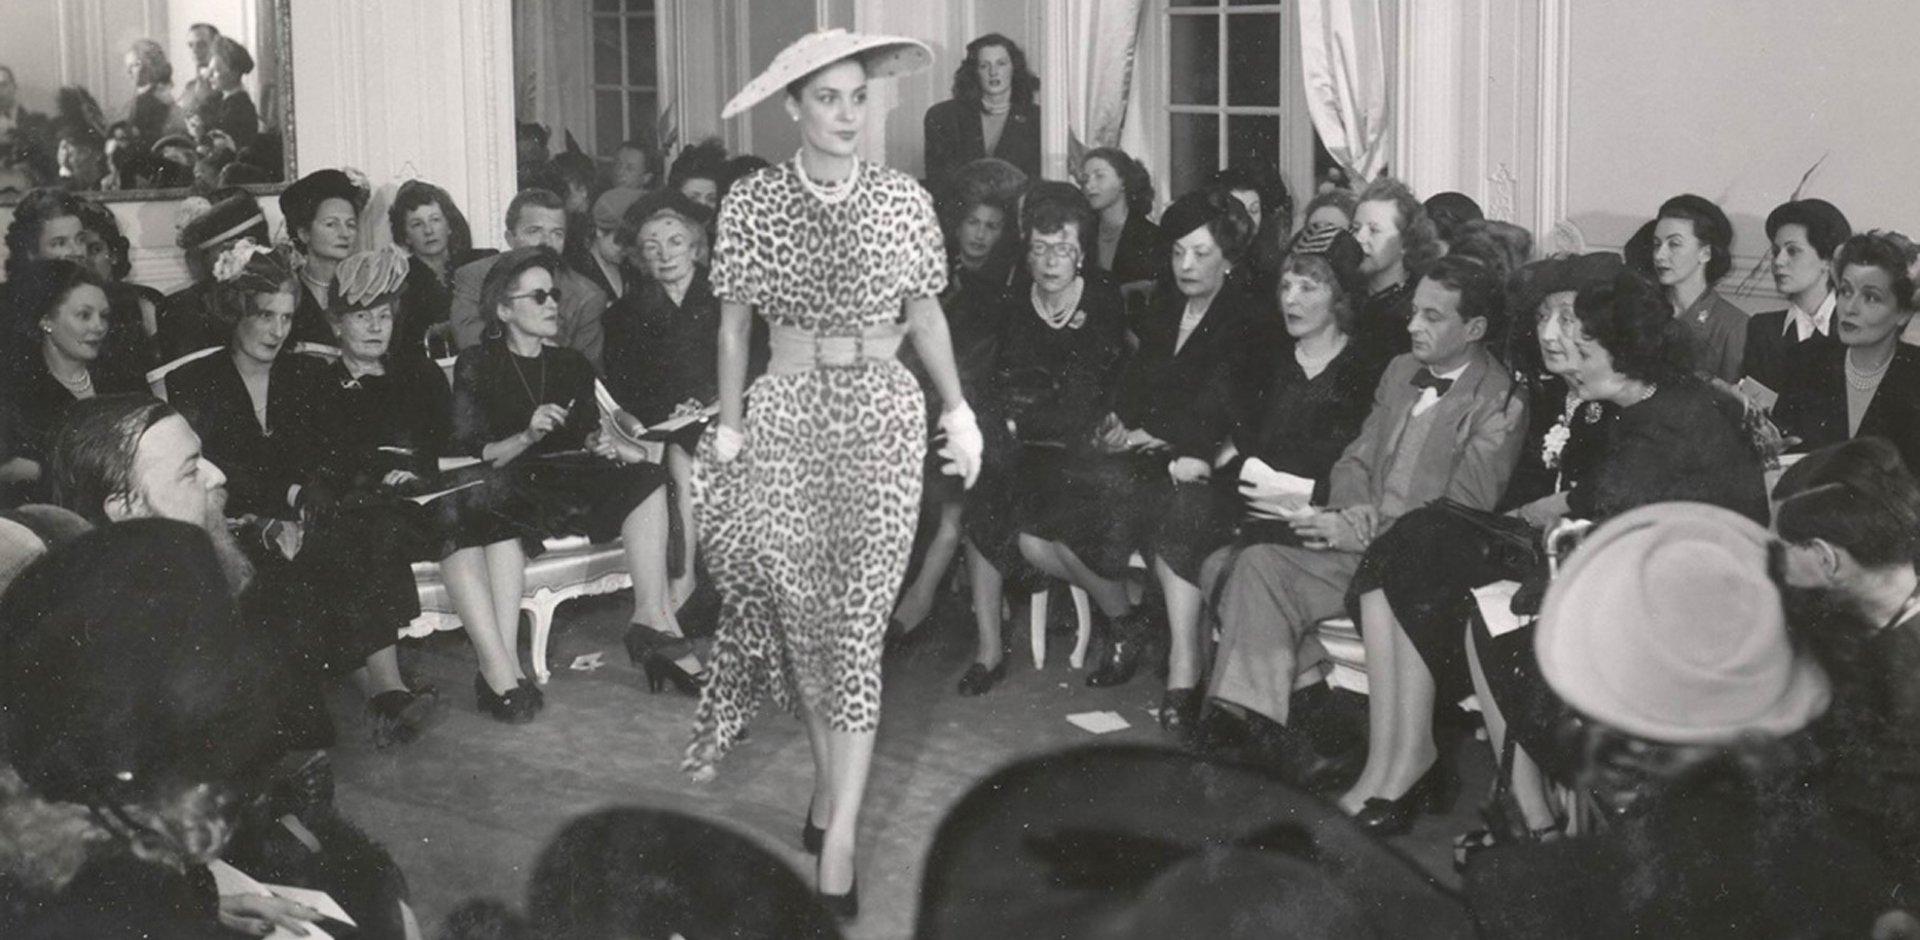 animalier, trend, abiti animalier, christian Dior,